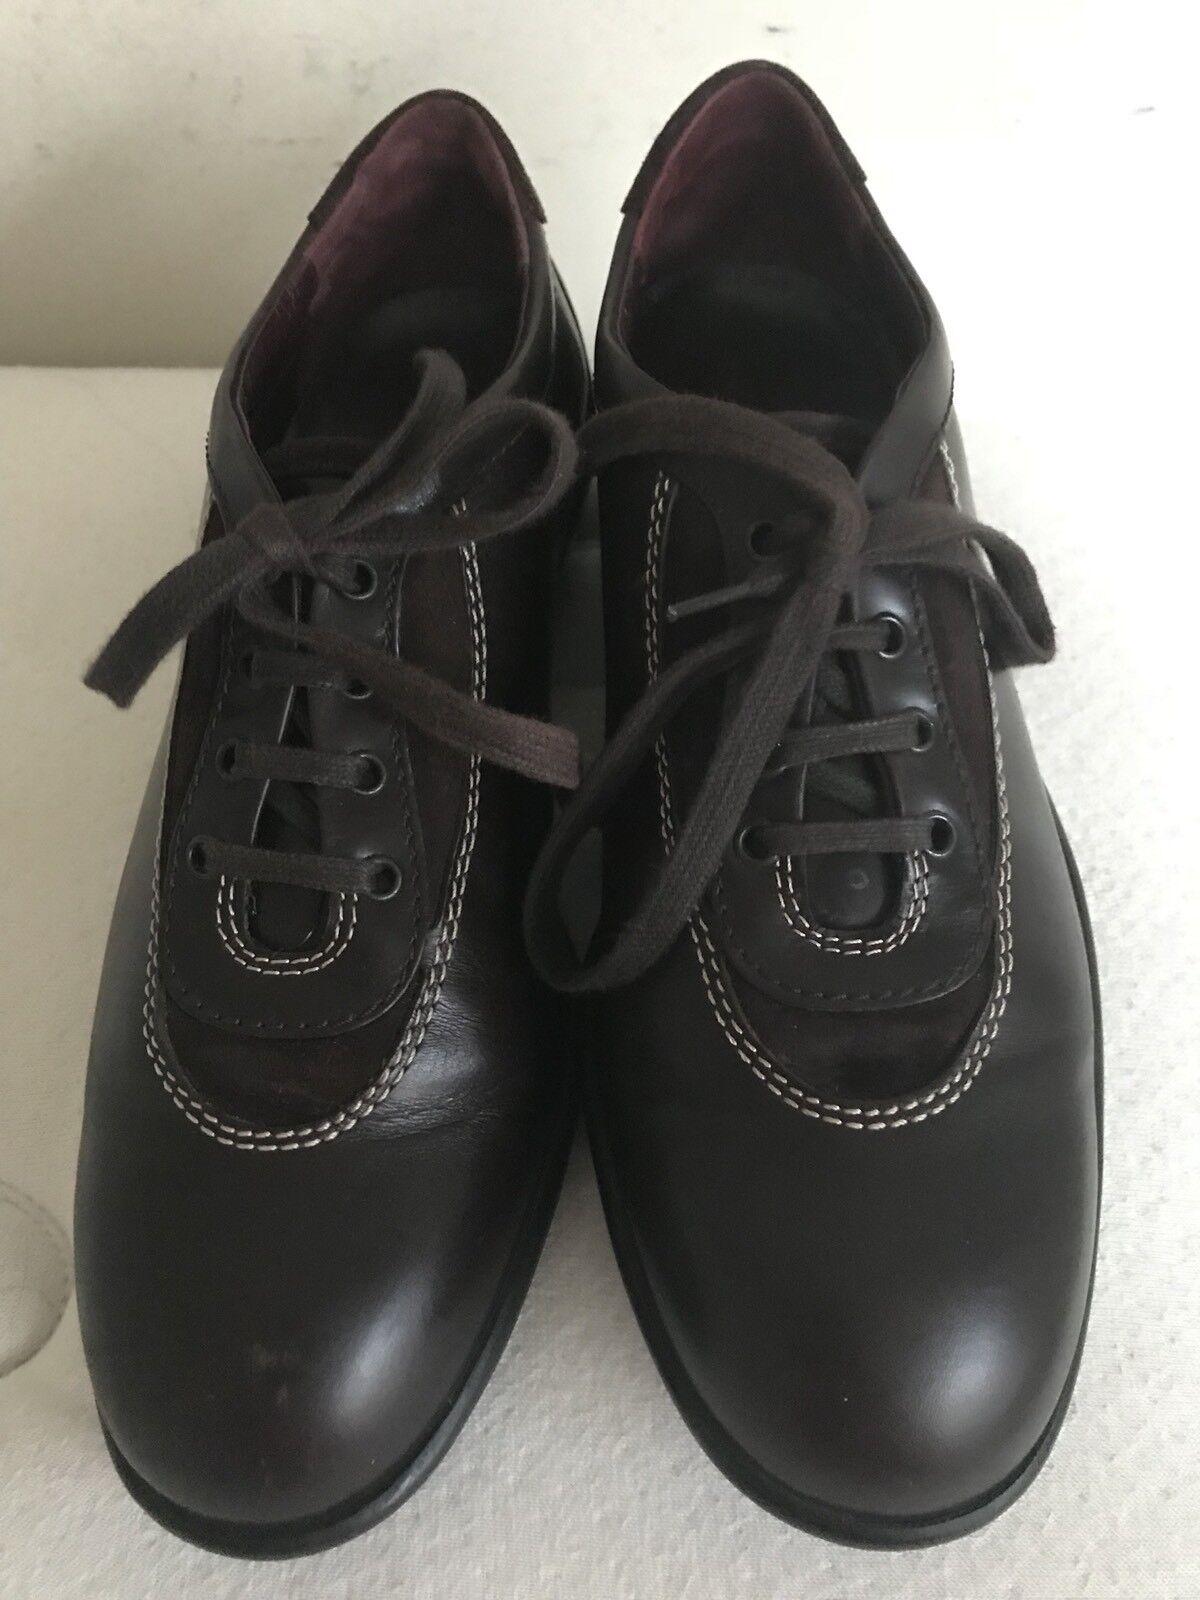 Tod's Wouomo Marronee Leather Fashion scarpe da ginnastica  36  U.S. 6  Made In      545